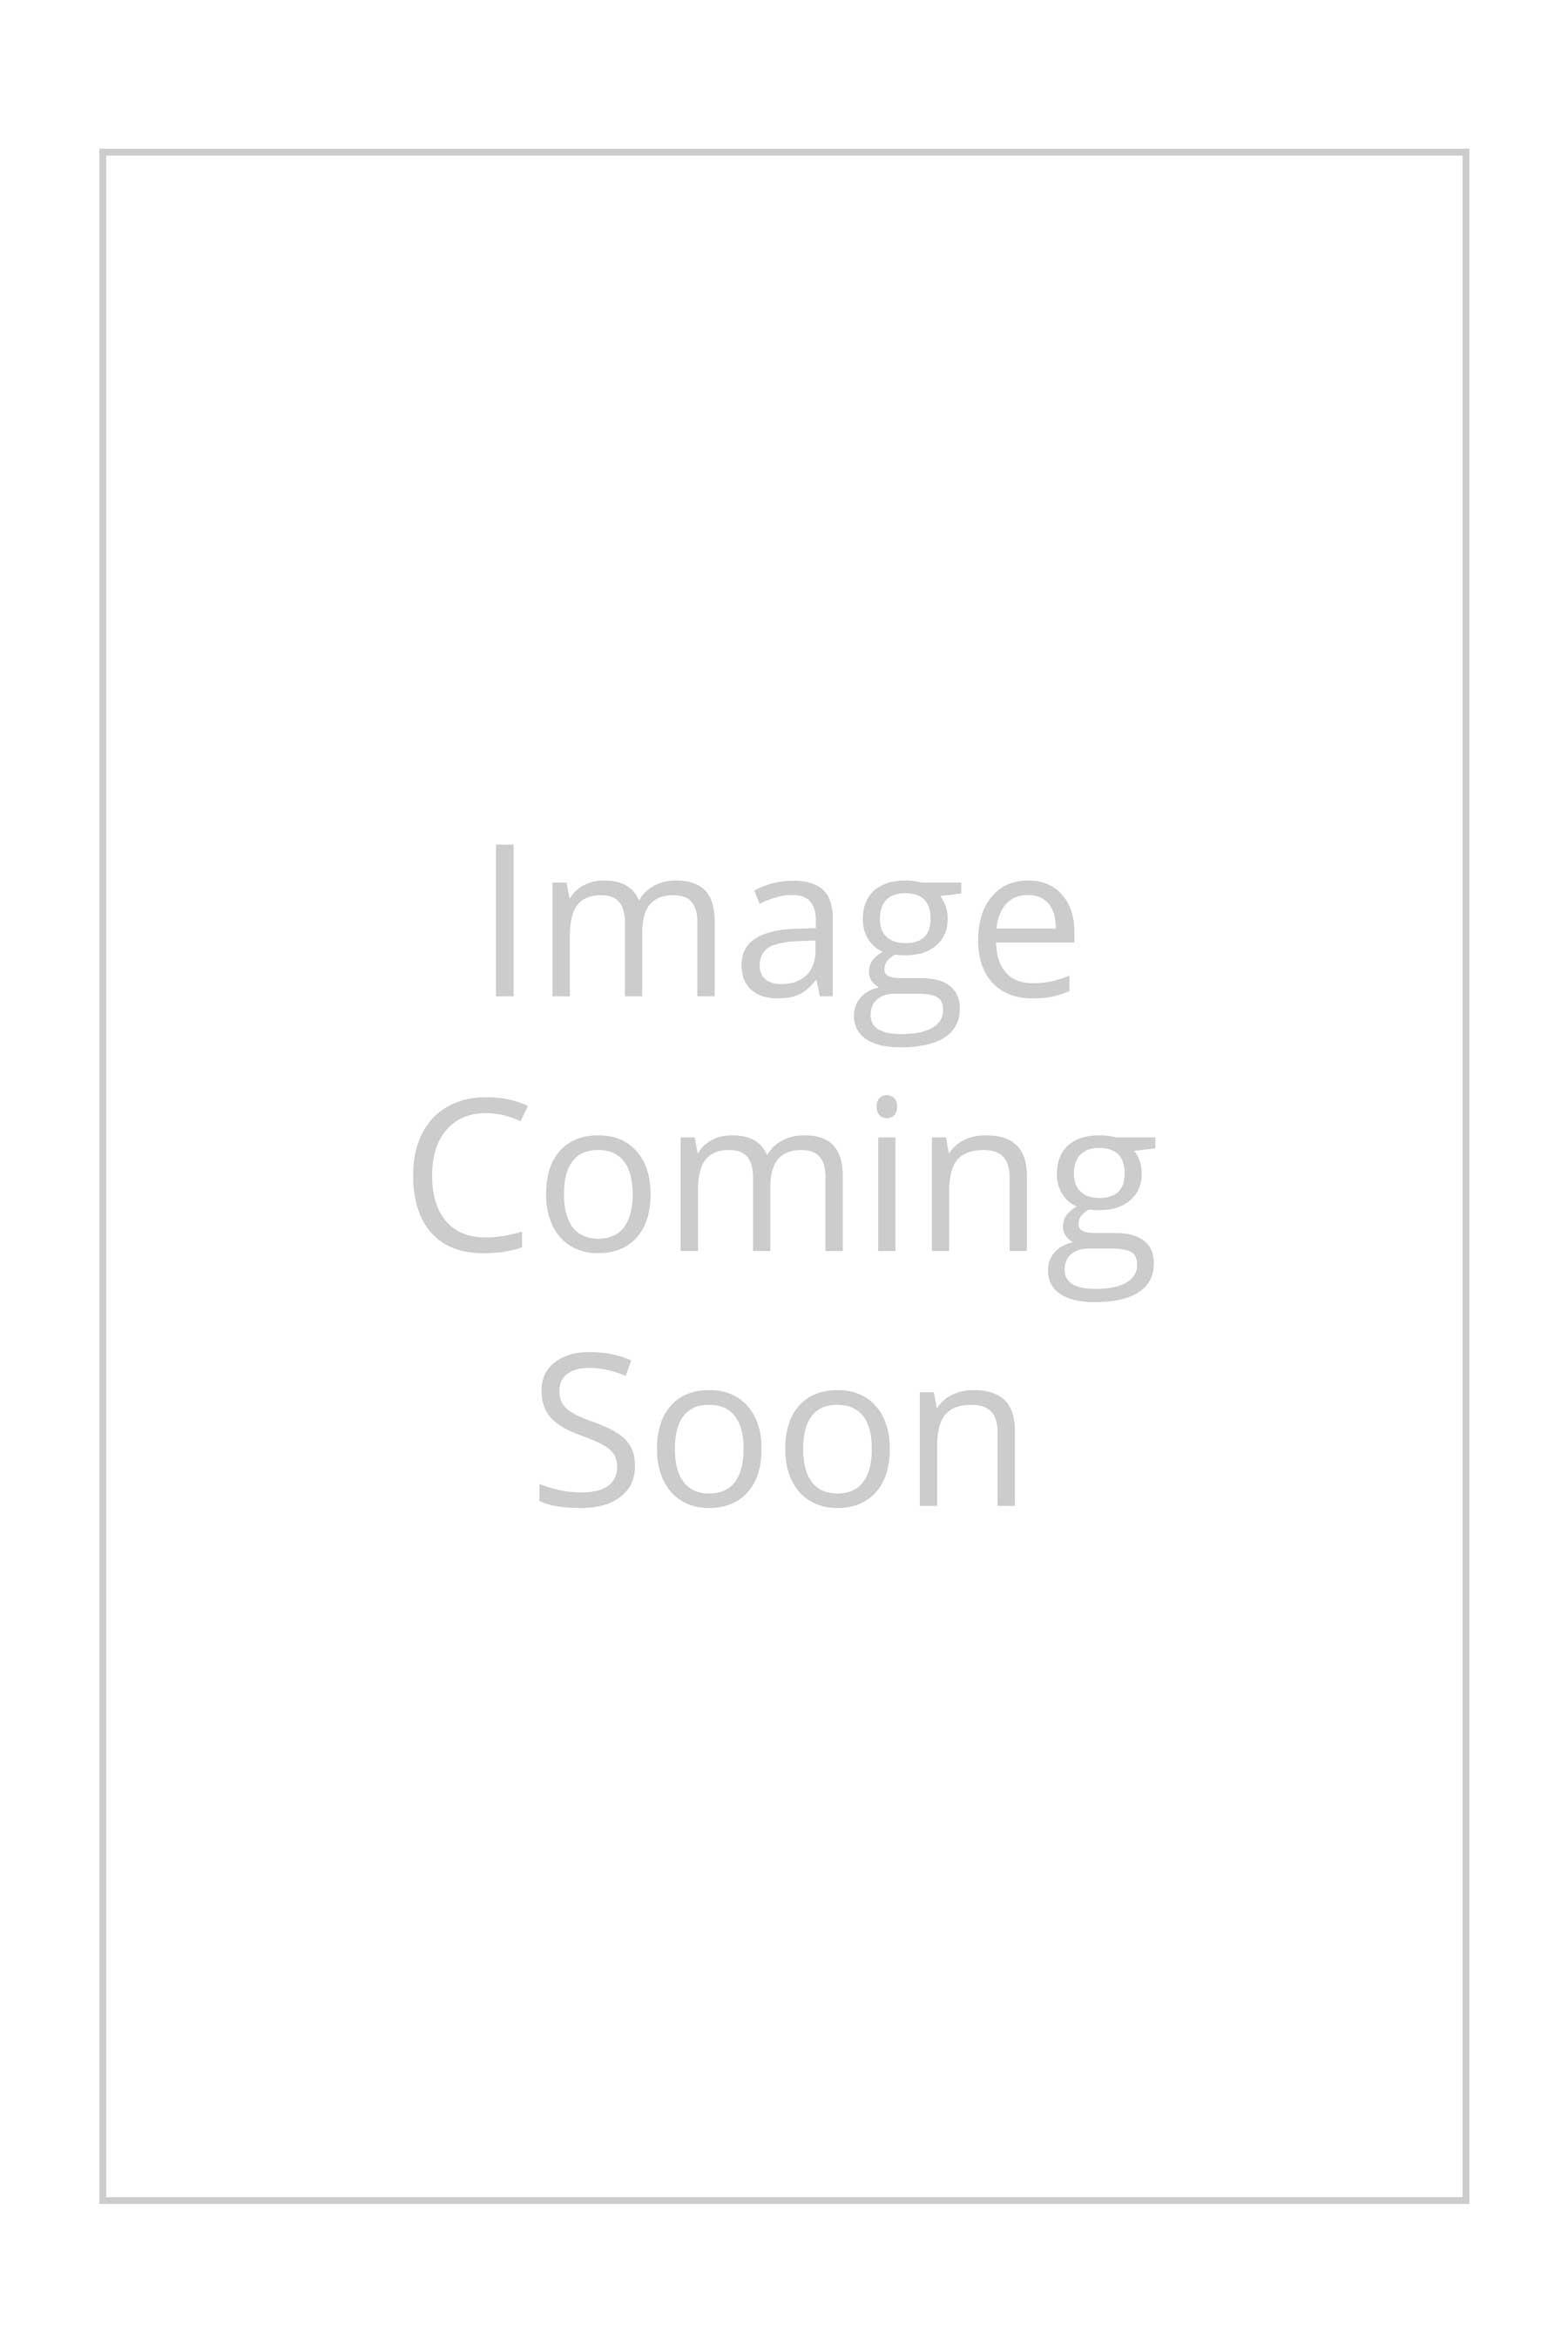 St John Black Santana Knit Evening Gown w/ Gold Vest Studded Accents